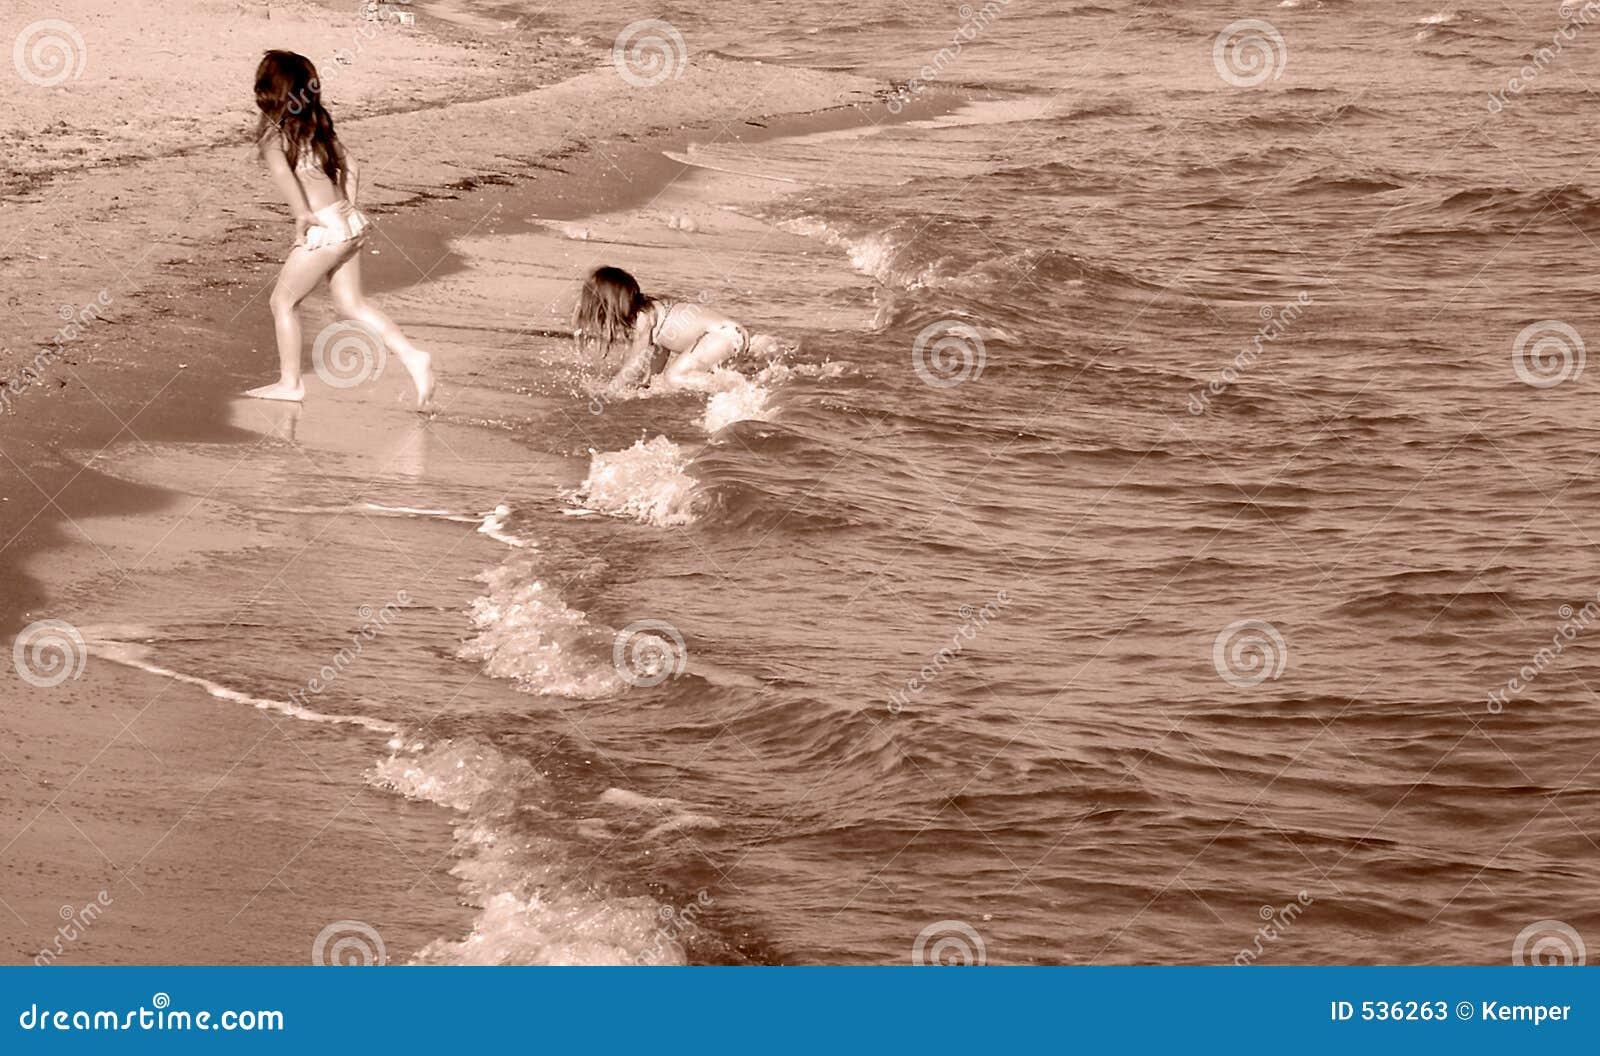 Download 婴孩沙子 库存图片. 图片 包括有 含沙, 海洋, 本质, 作用, 开掘, 子项, 乐趣, 女性, 人们, 通知 - 536263